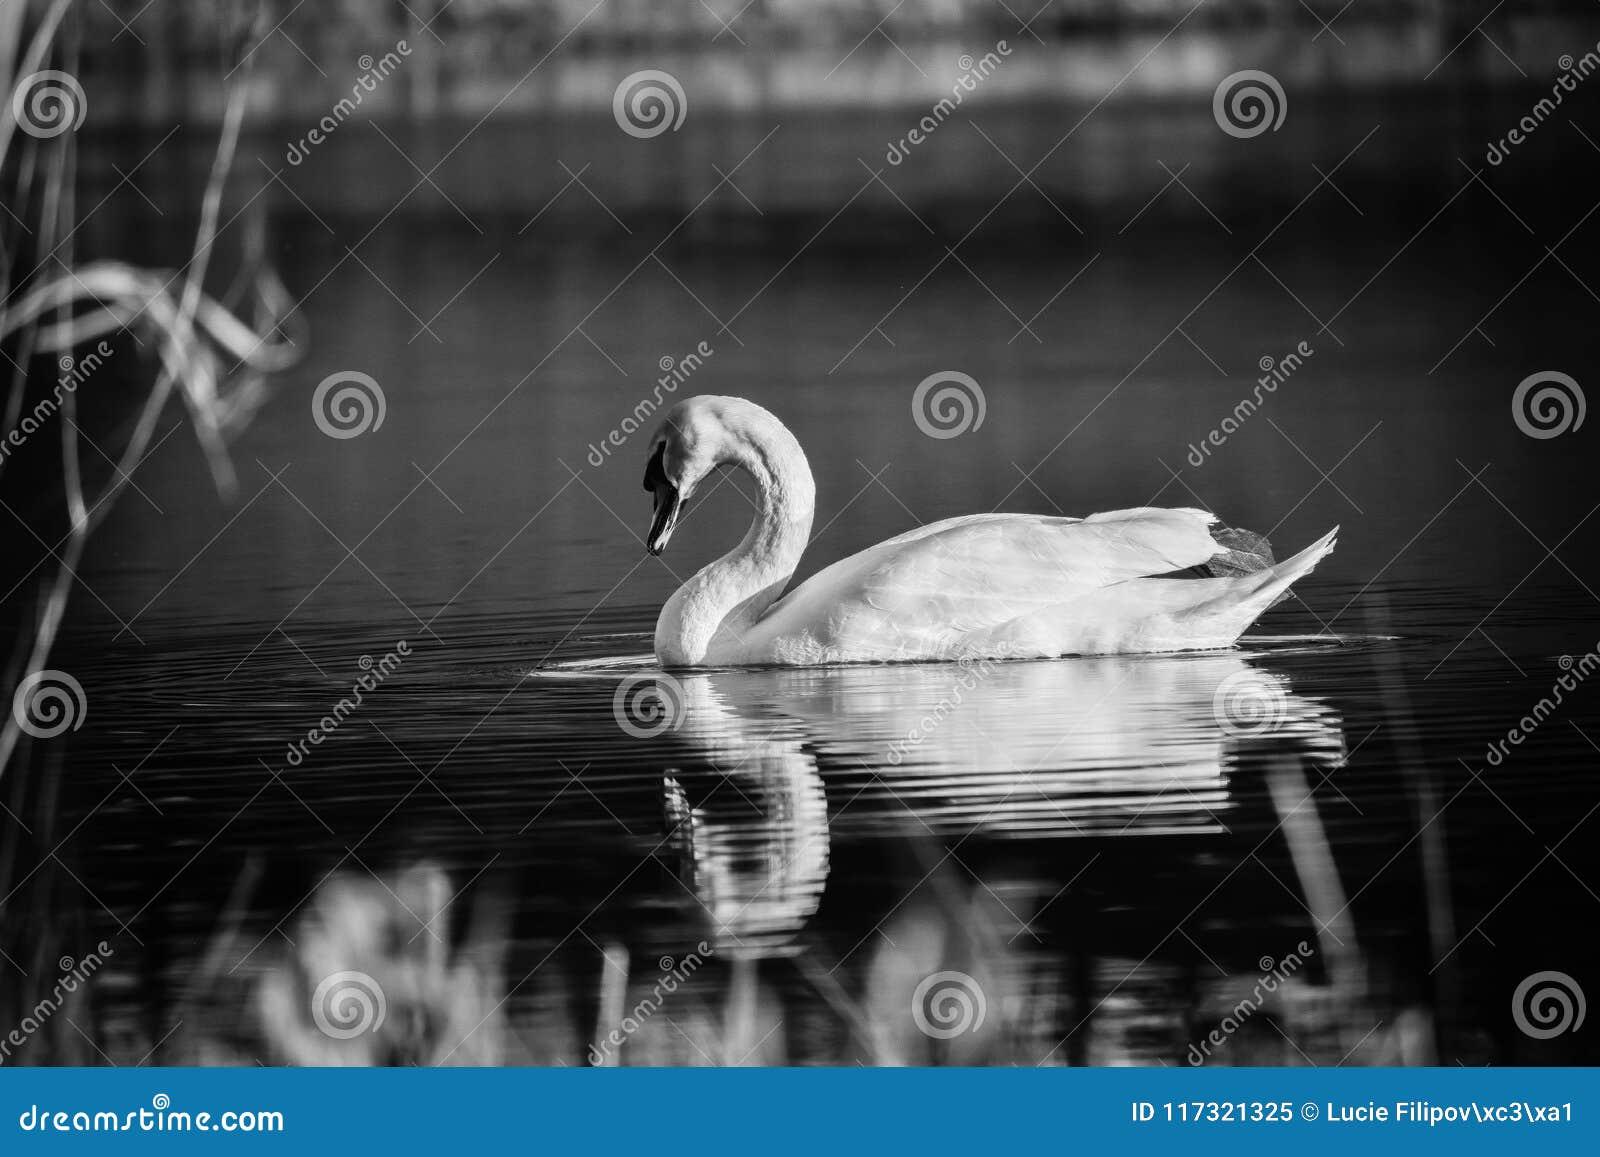 Swollen-headed swan